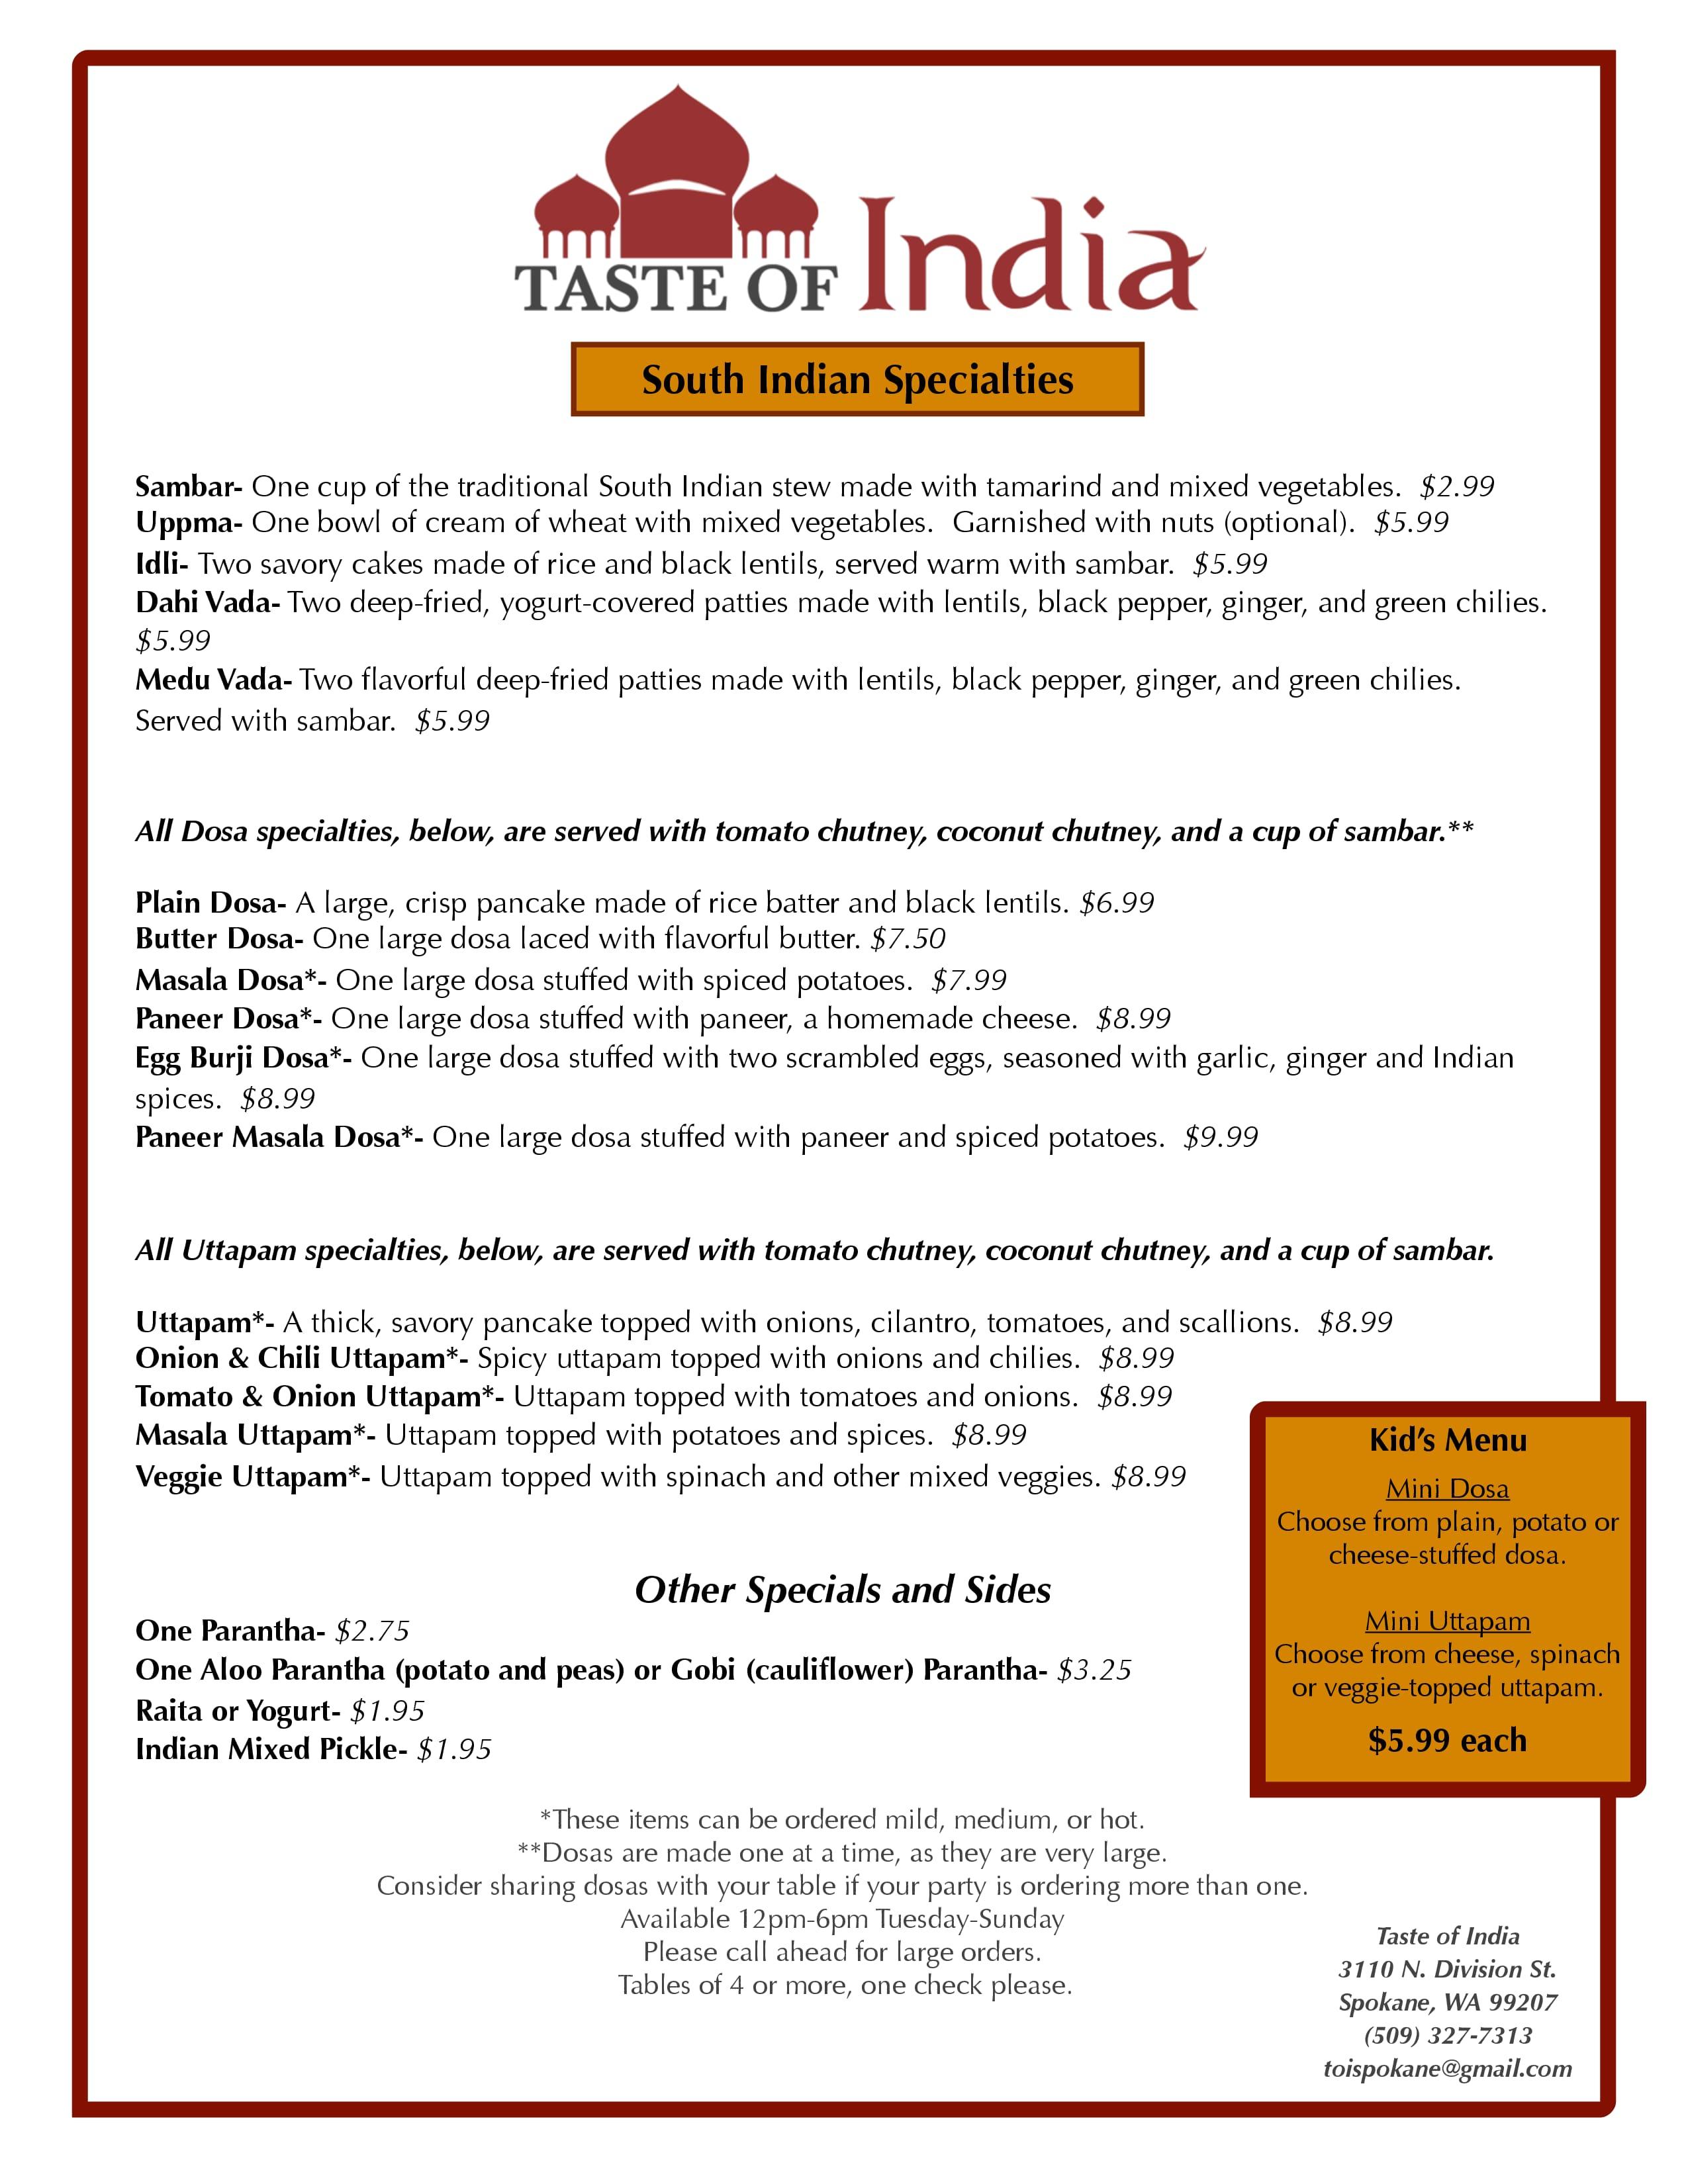 Taste of India Menu, Menu for Taste of India, Spokane, Spokane ...